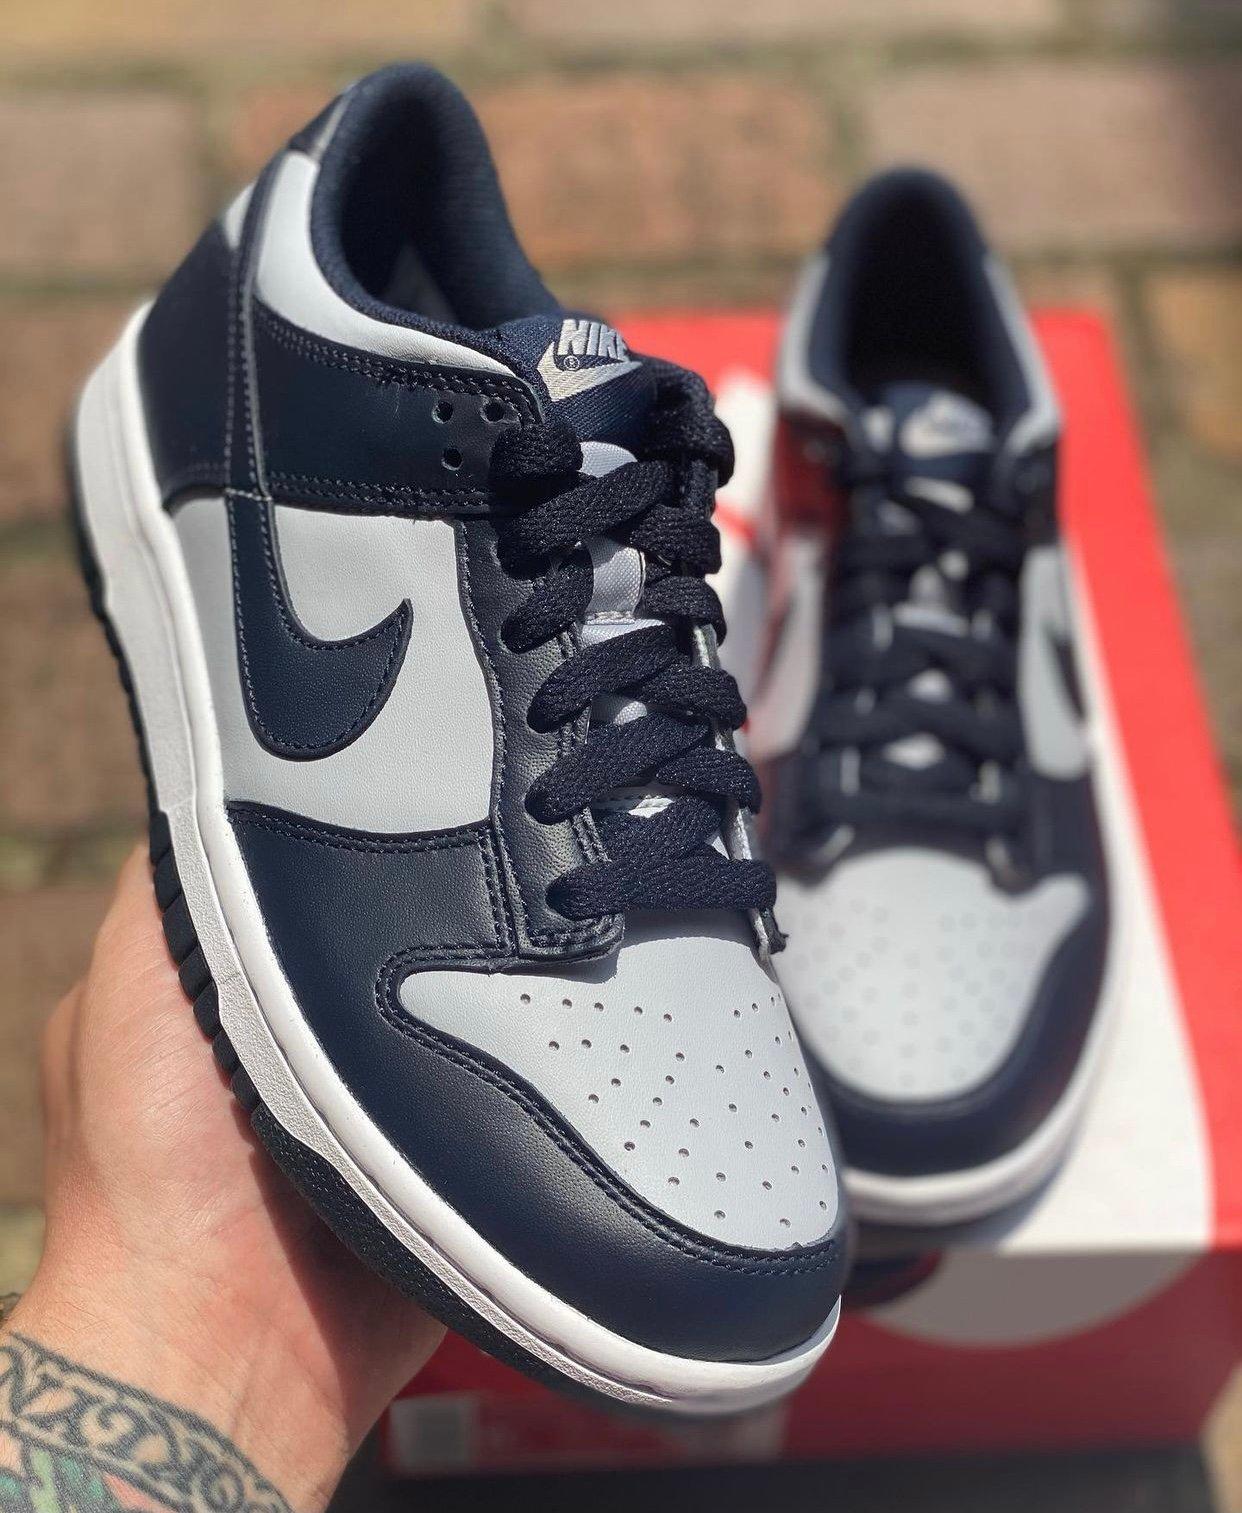 nike 90 boys size 7y shoes hibbett store Georgetown Release Date